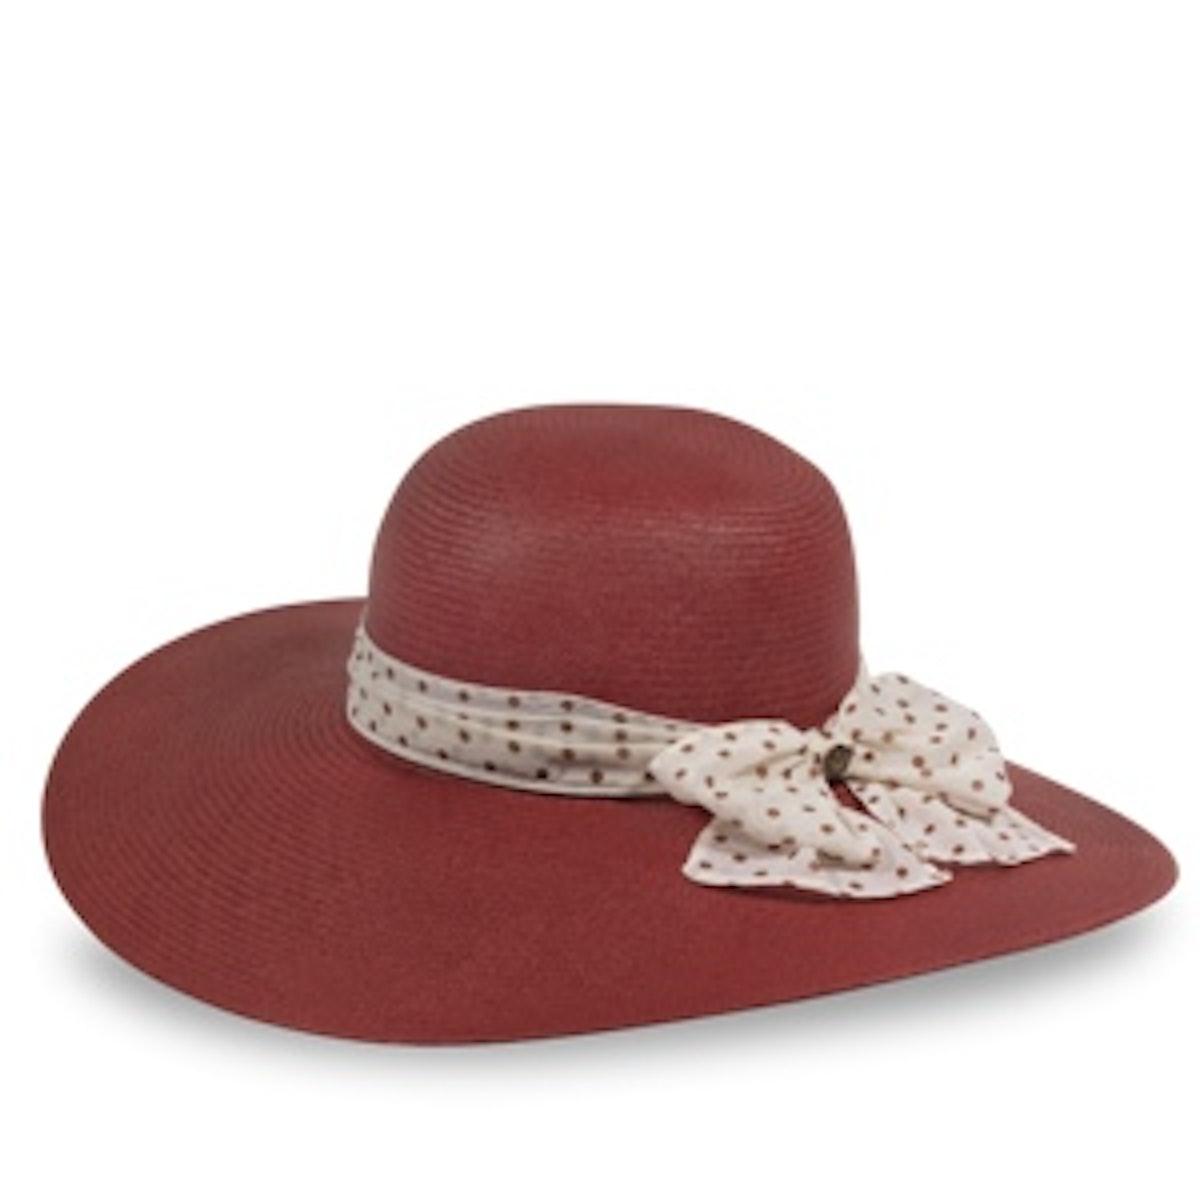 Mrs. Perfecta Hat